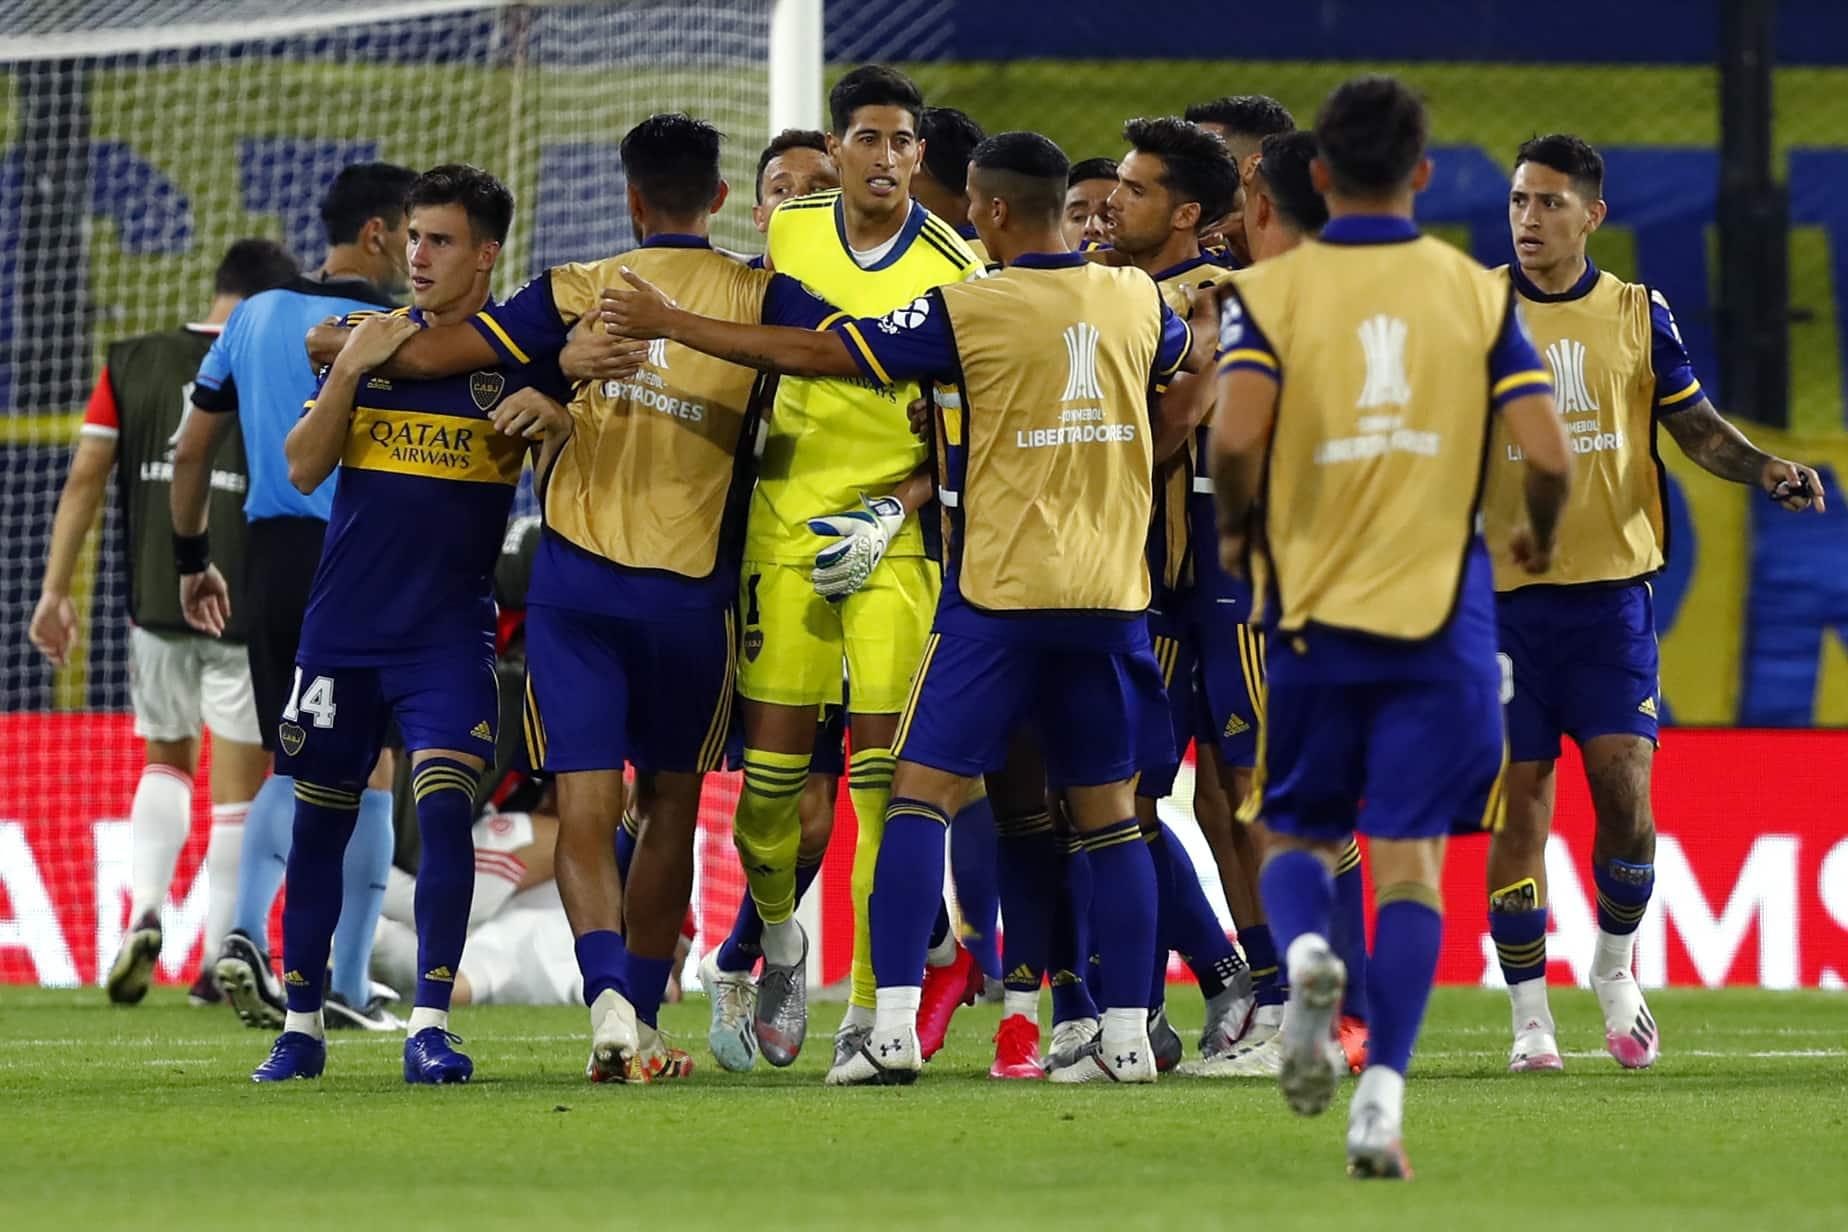 Copa Libertadores: Boca llegó a cuartos de final por penales y enfrentará a Racing